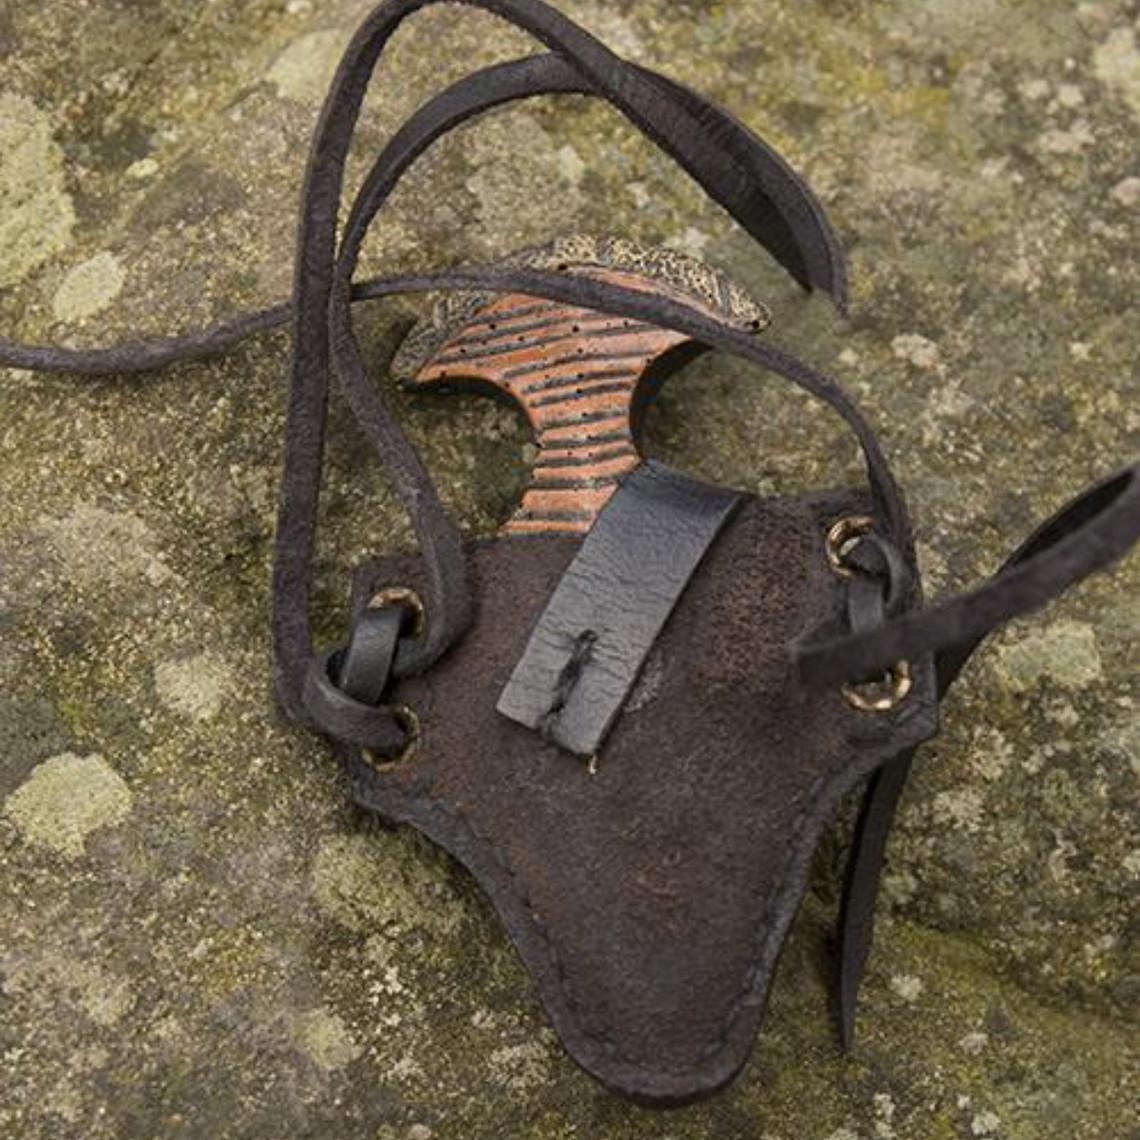 Epic Armoury LARP poignard poignet avec support, noir